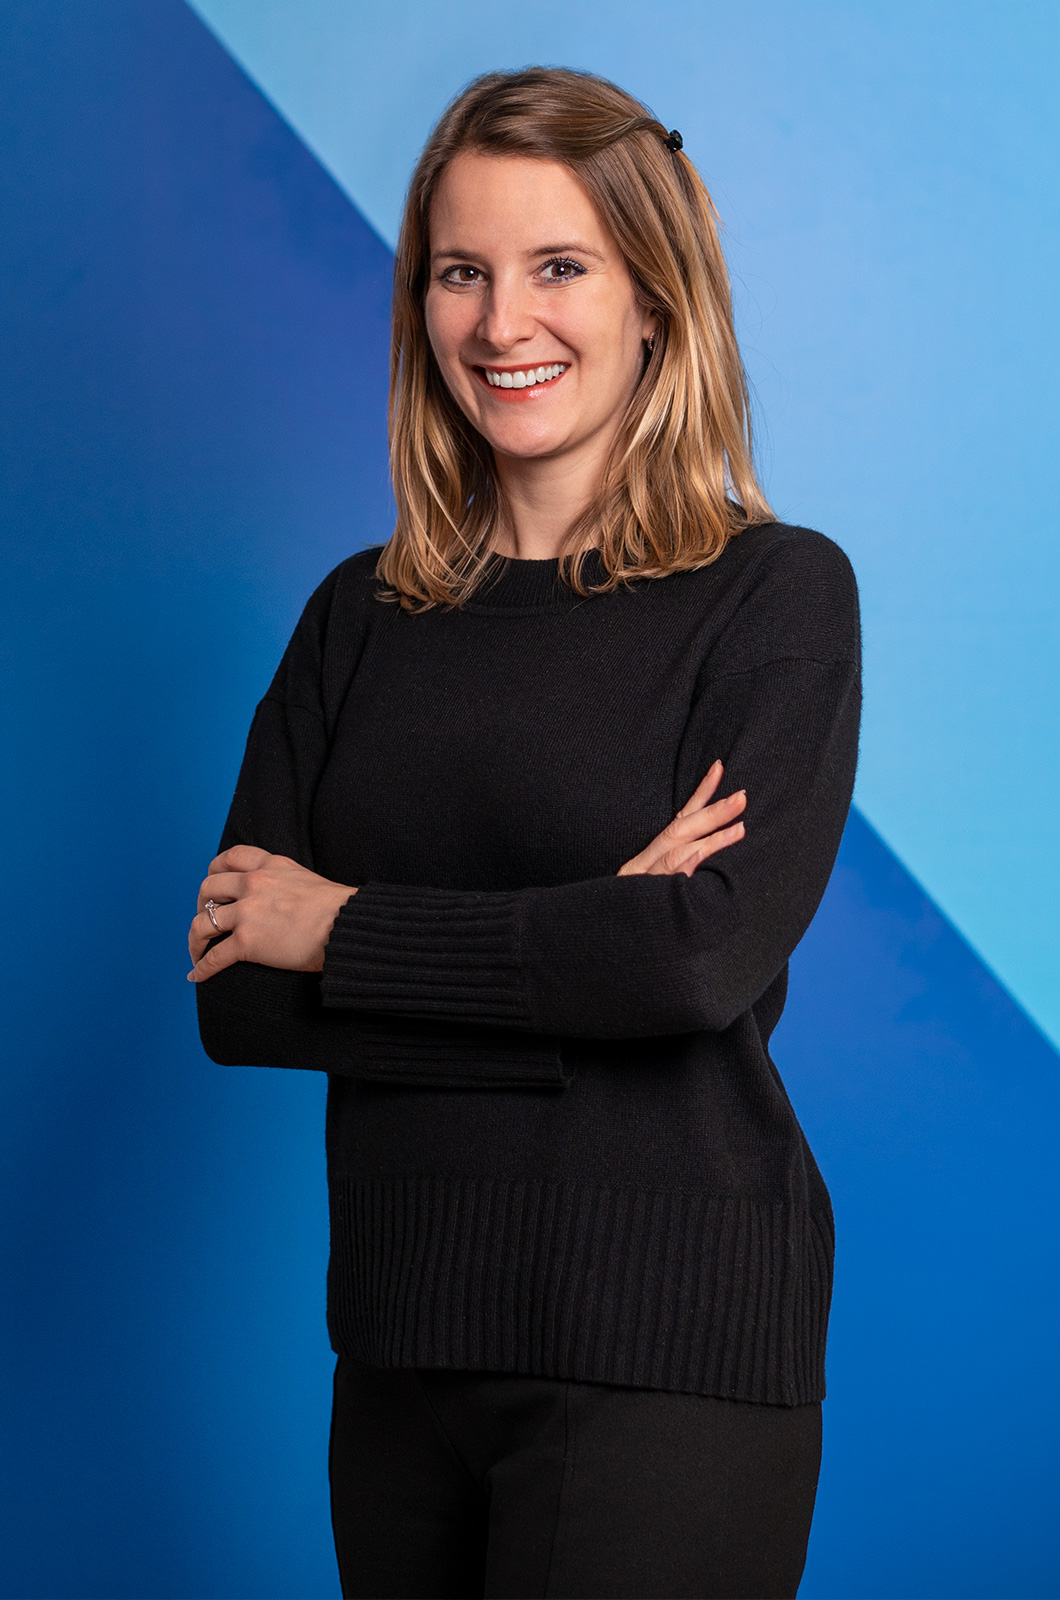 Manuela Schlumpf